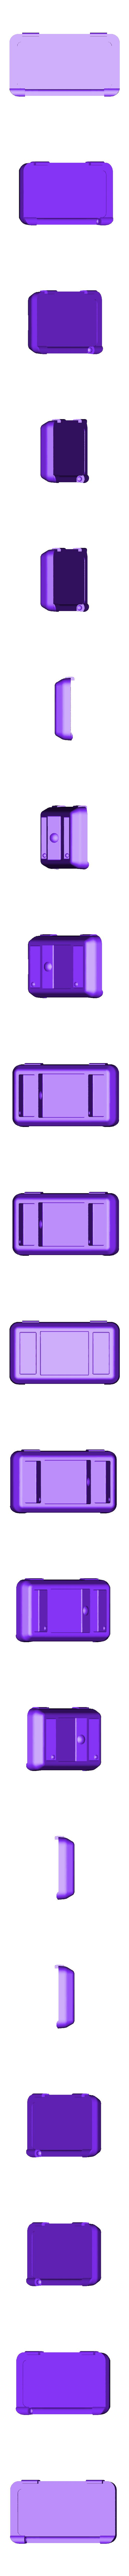 UpperBoxPart.stl Download STL file ToolBox • 3D printer template, EliGreen